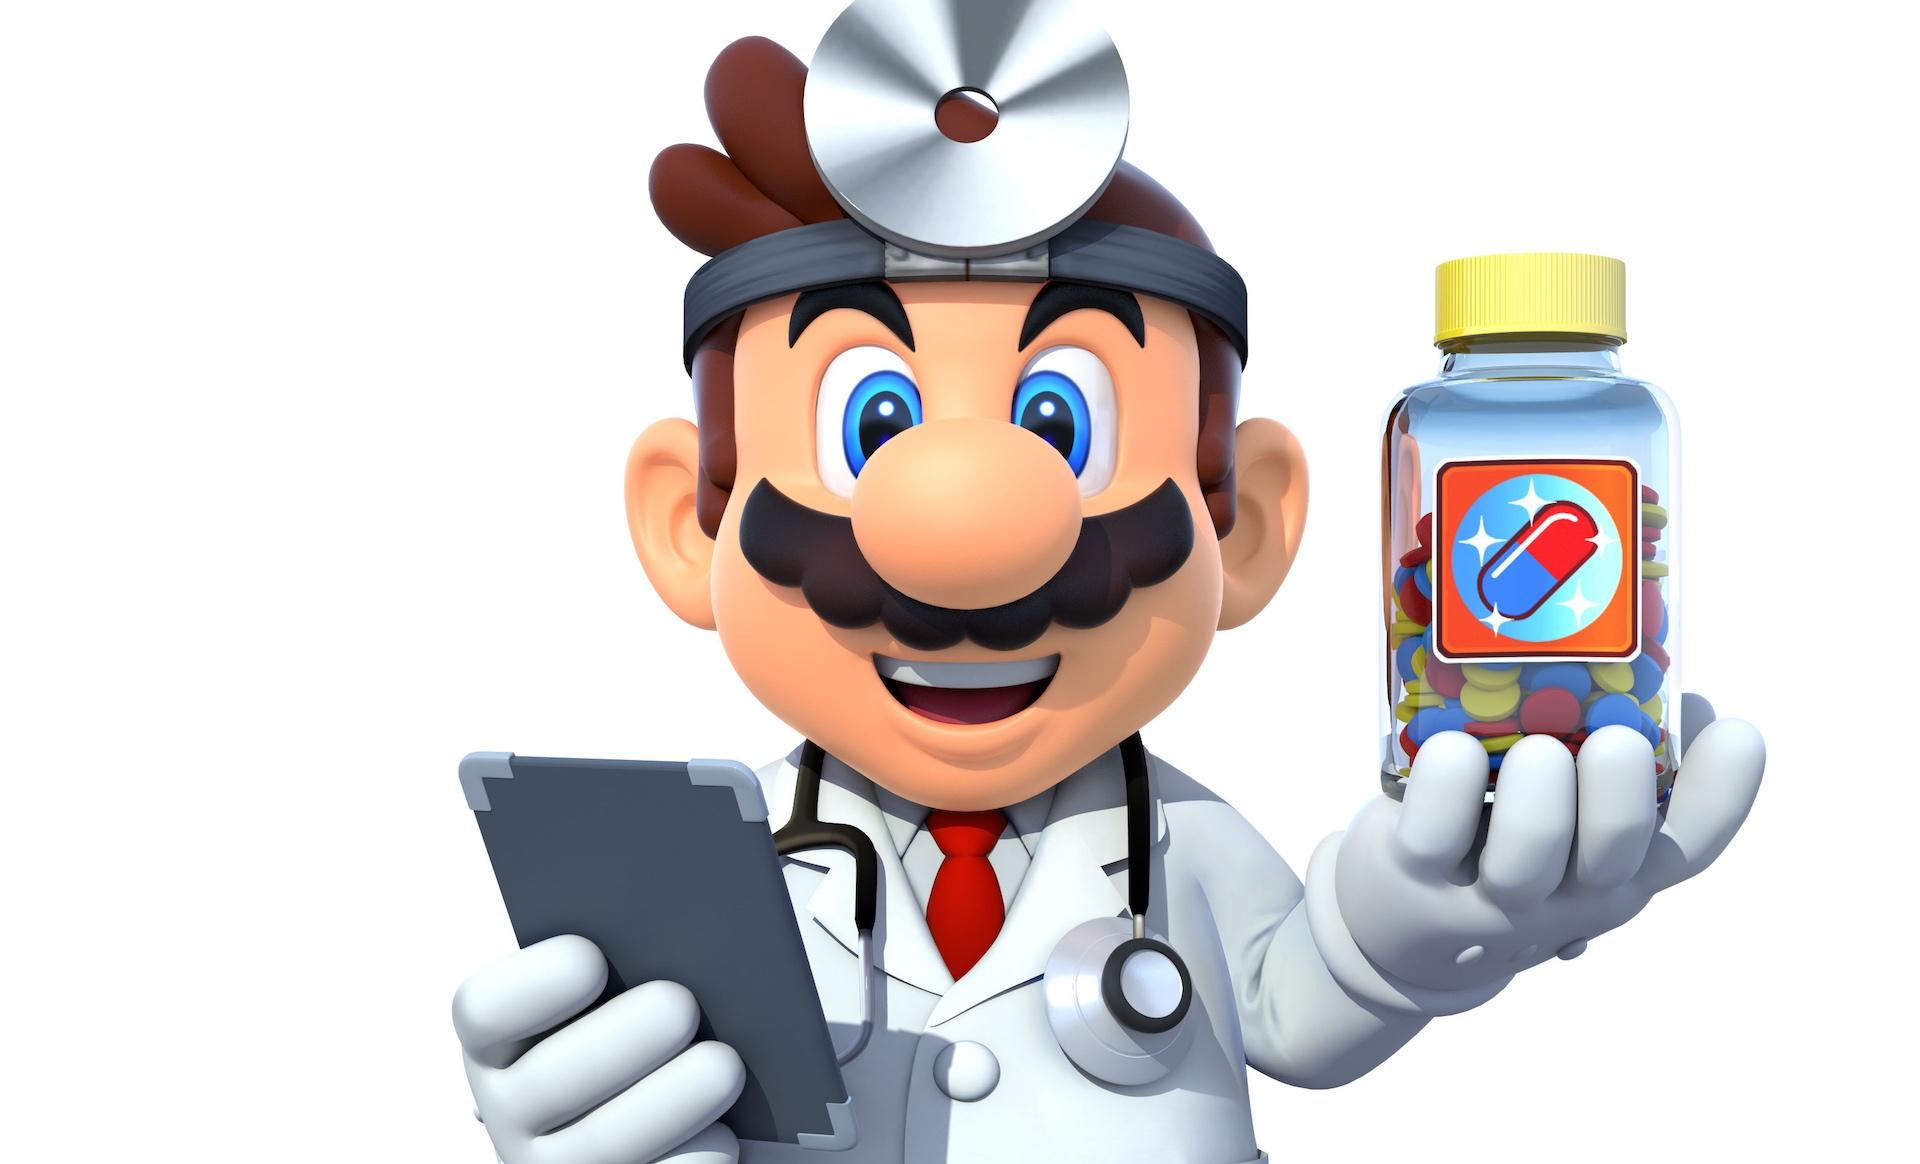 Nintendo announces new Dr. Mario for Android, iOS